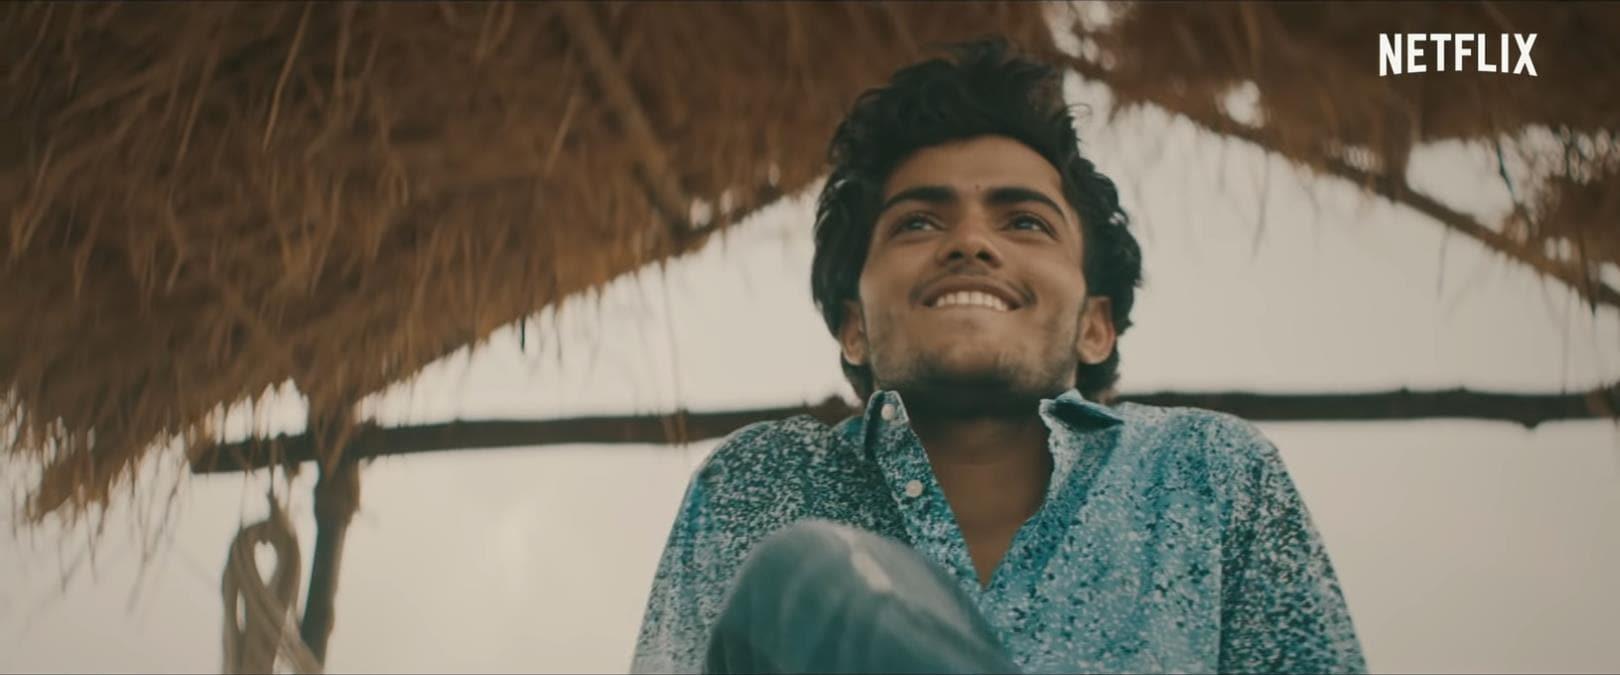 Jamtara: Release Date, Trailer, Cast Unveiled for Netflix's Next Indian Original Series